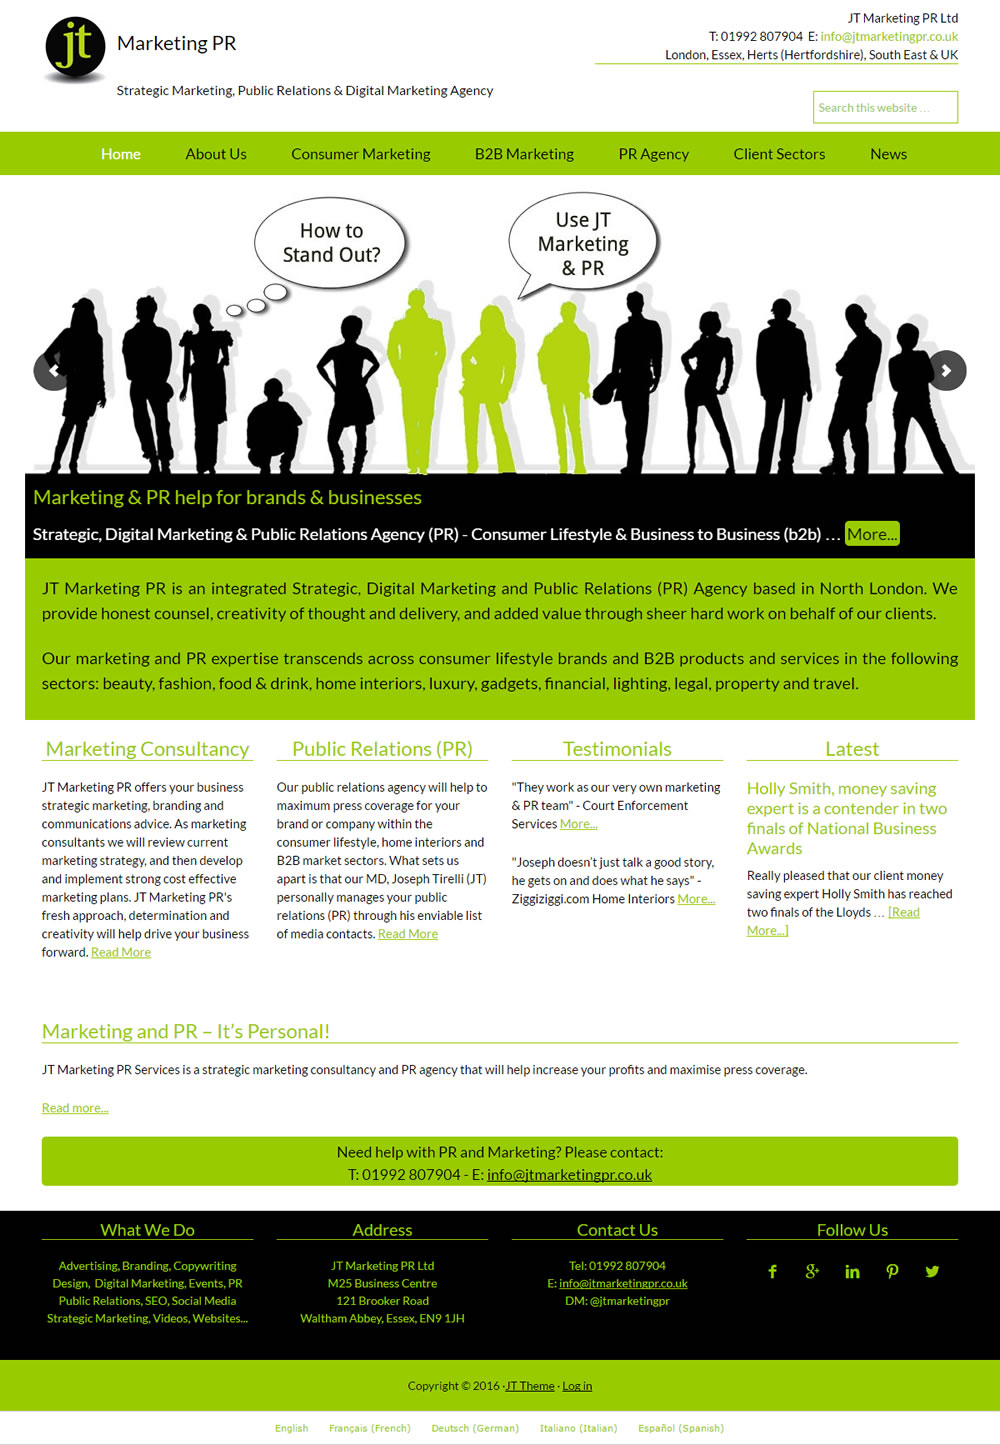 Wordpress web design for JT Marketing PR, Essex